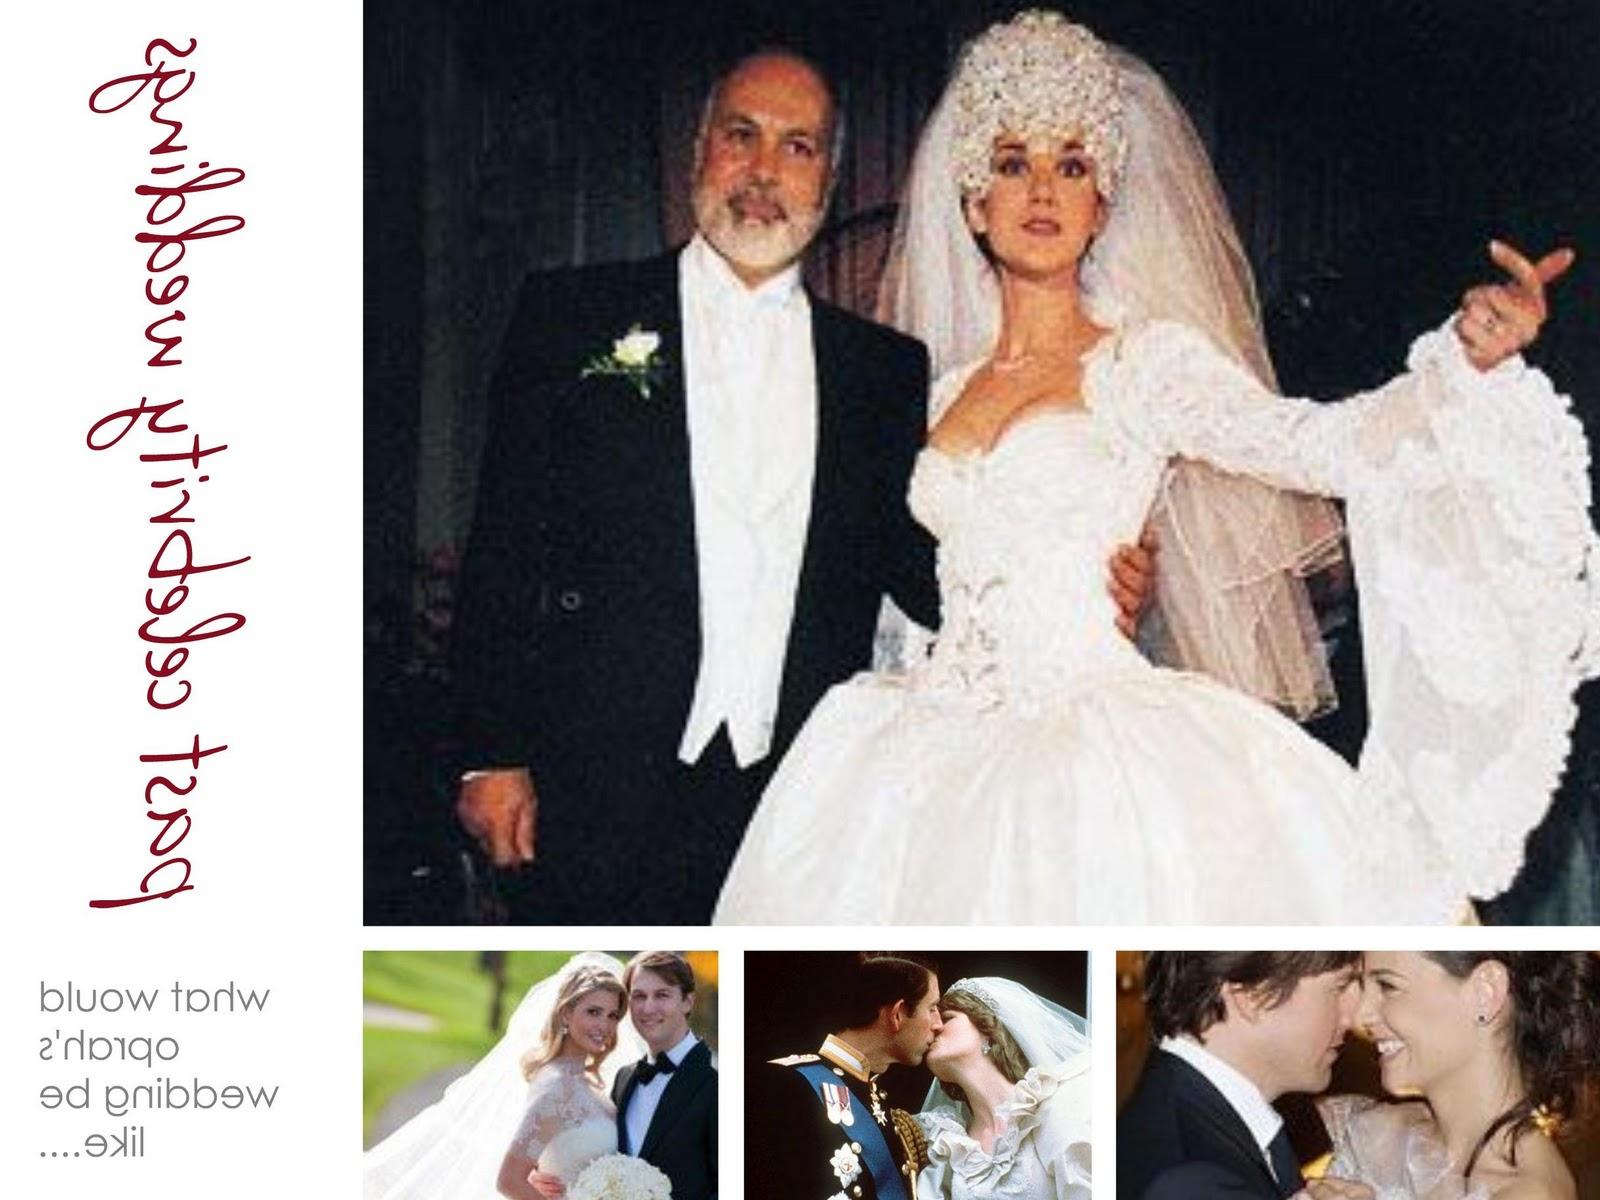 extravagant weddings of the